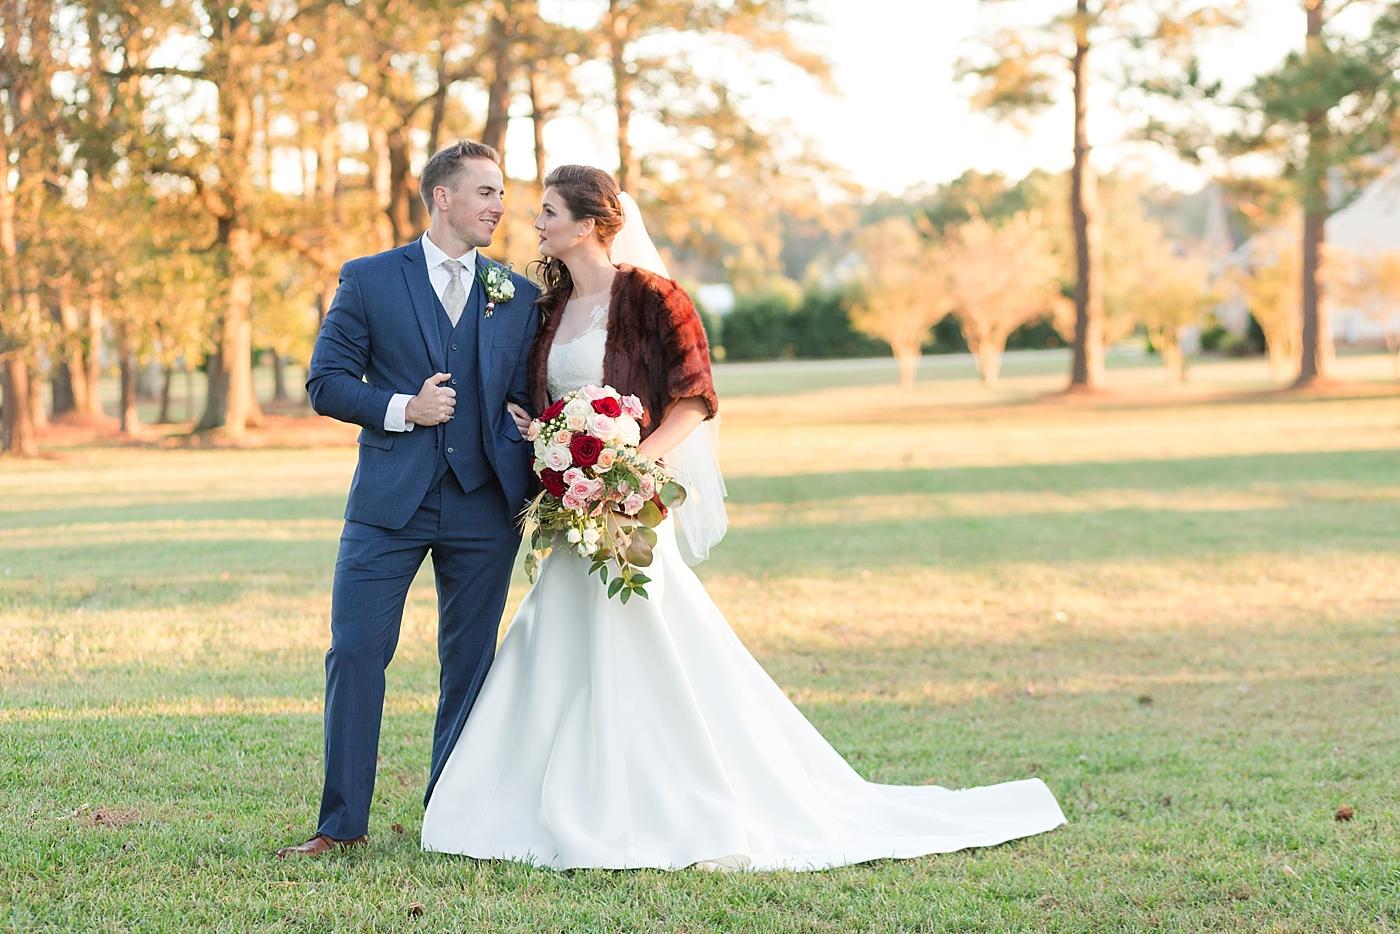 greenville-nc-wedding-the-robins-nest_54.jpg